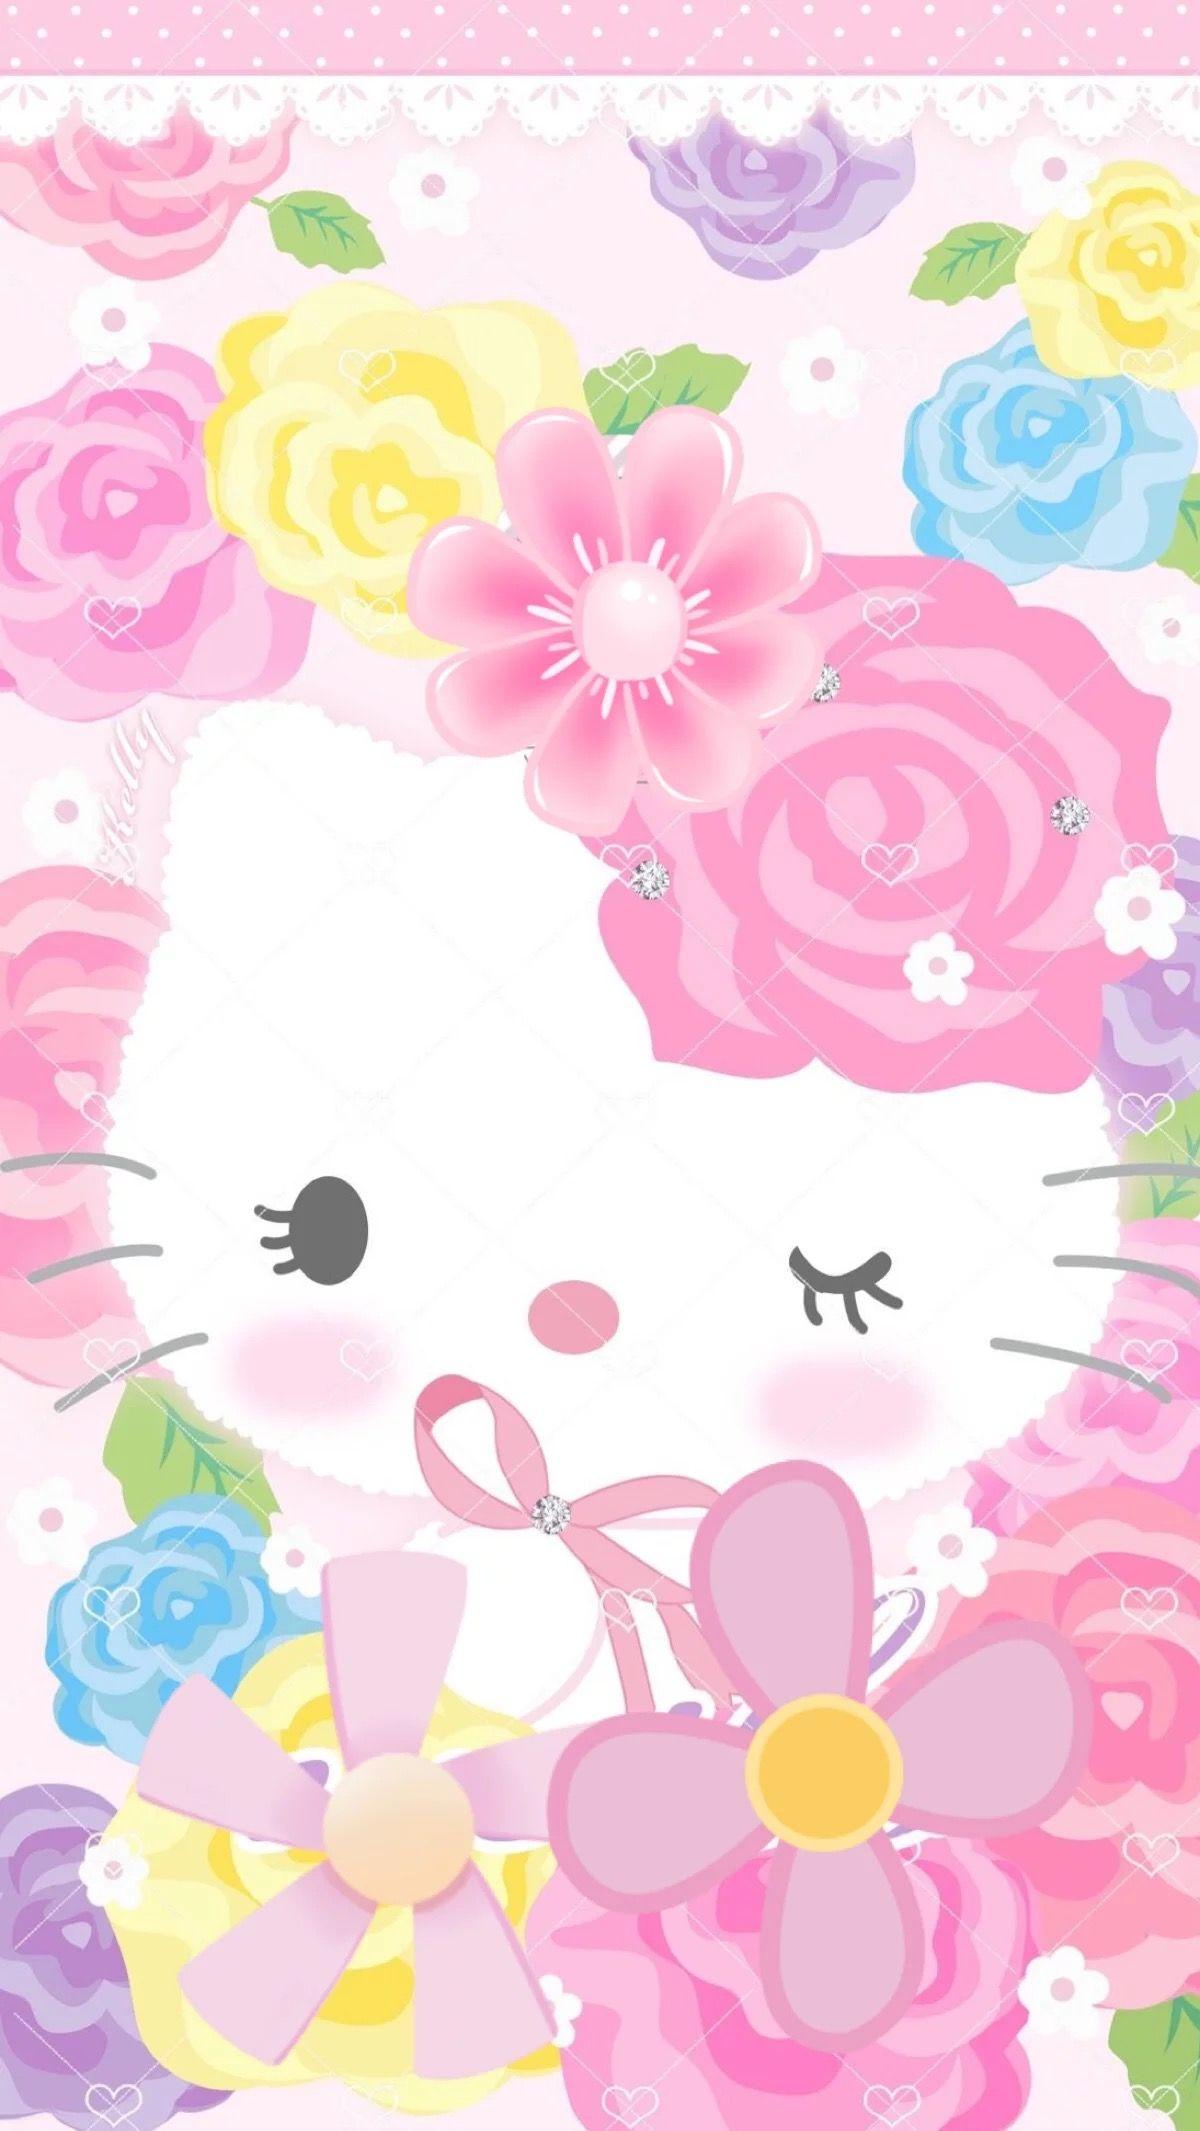 Hello Kitty Hello Kitty Drawing Hello Kitty Pictures Hello Kitty Backgrounds